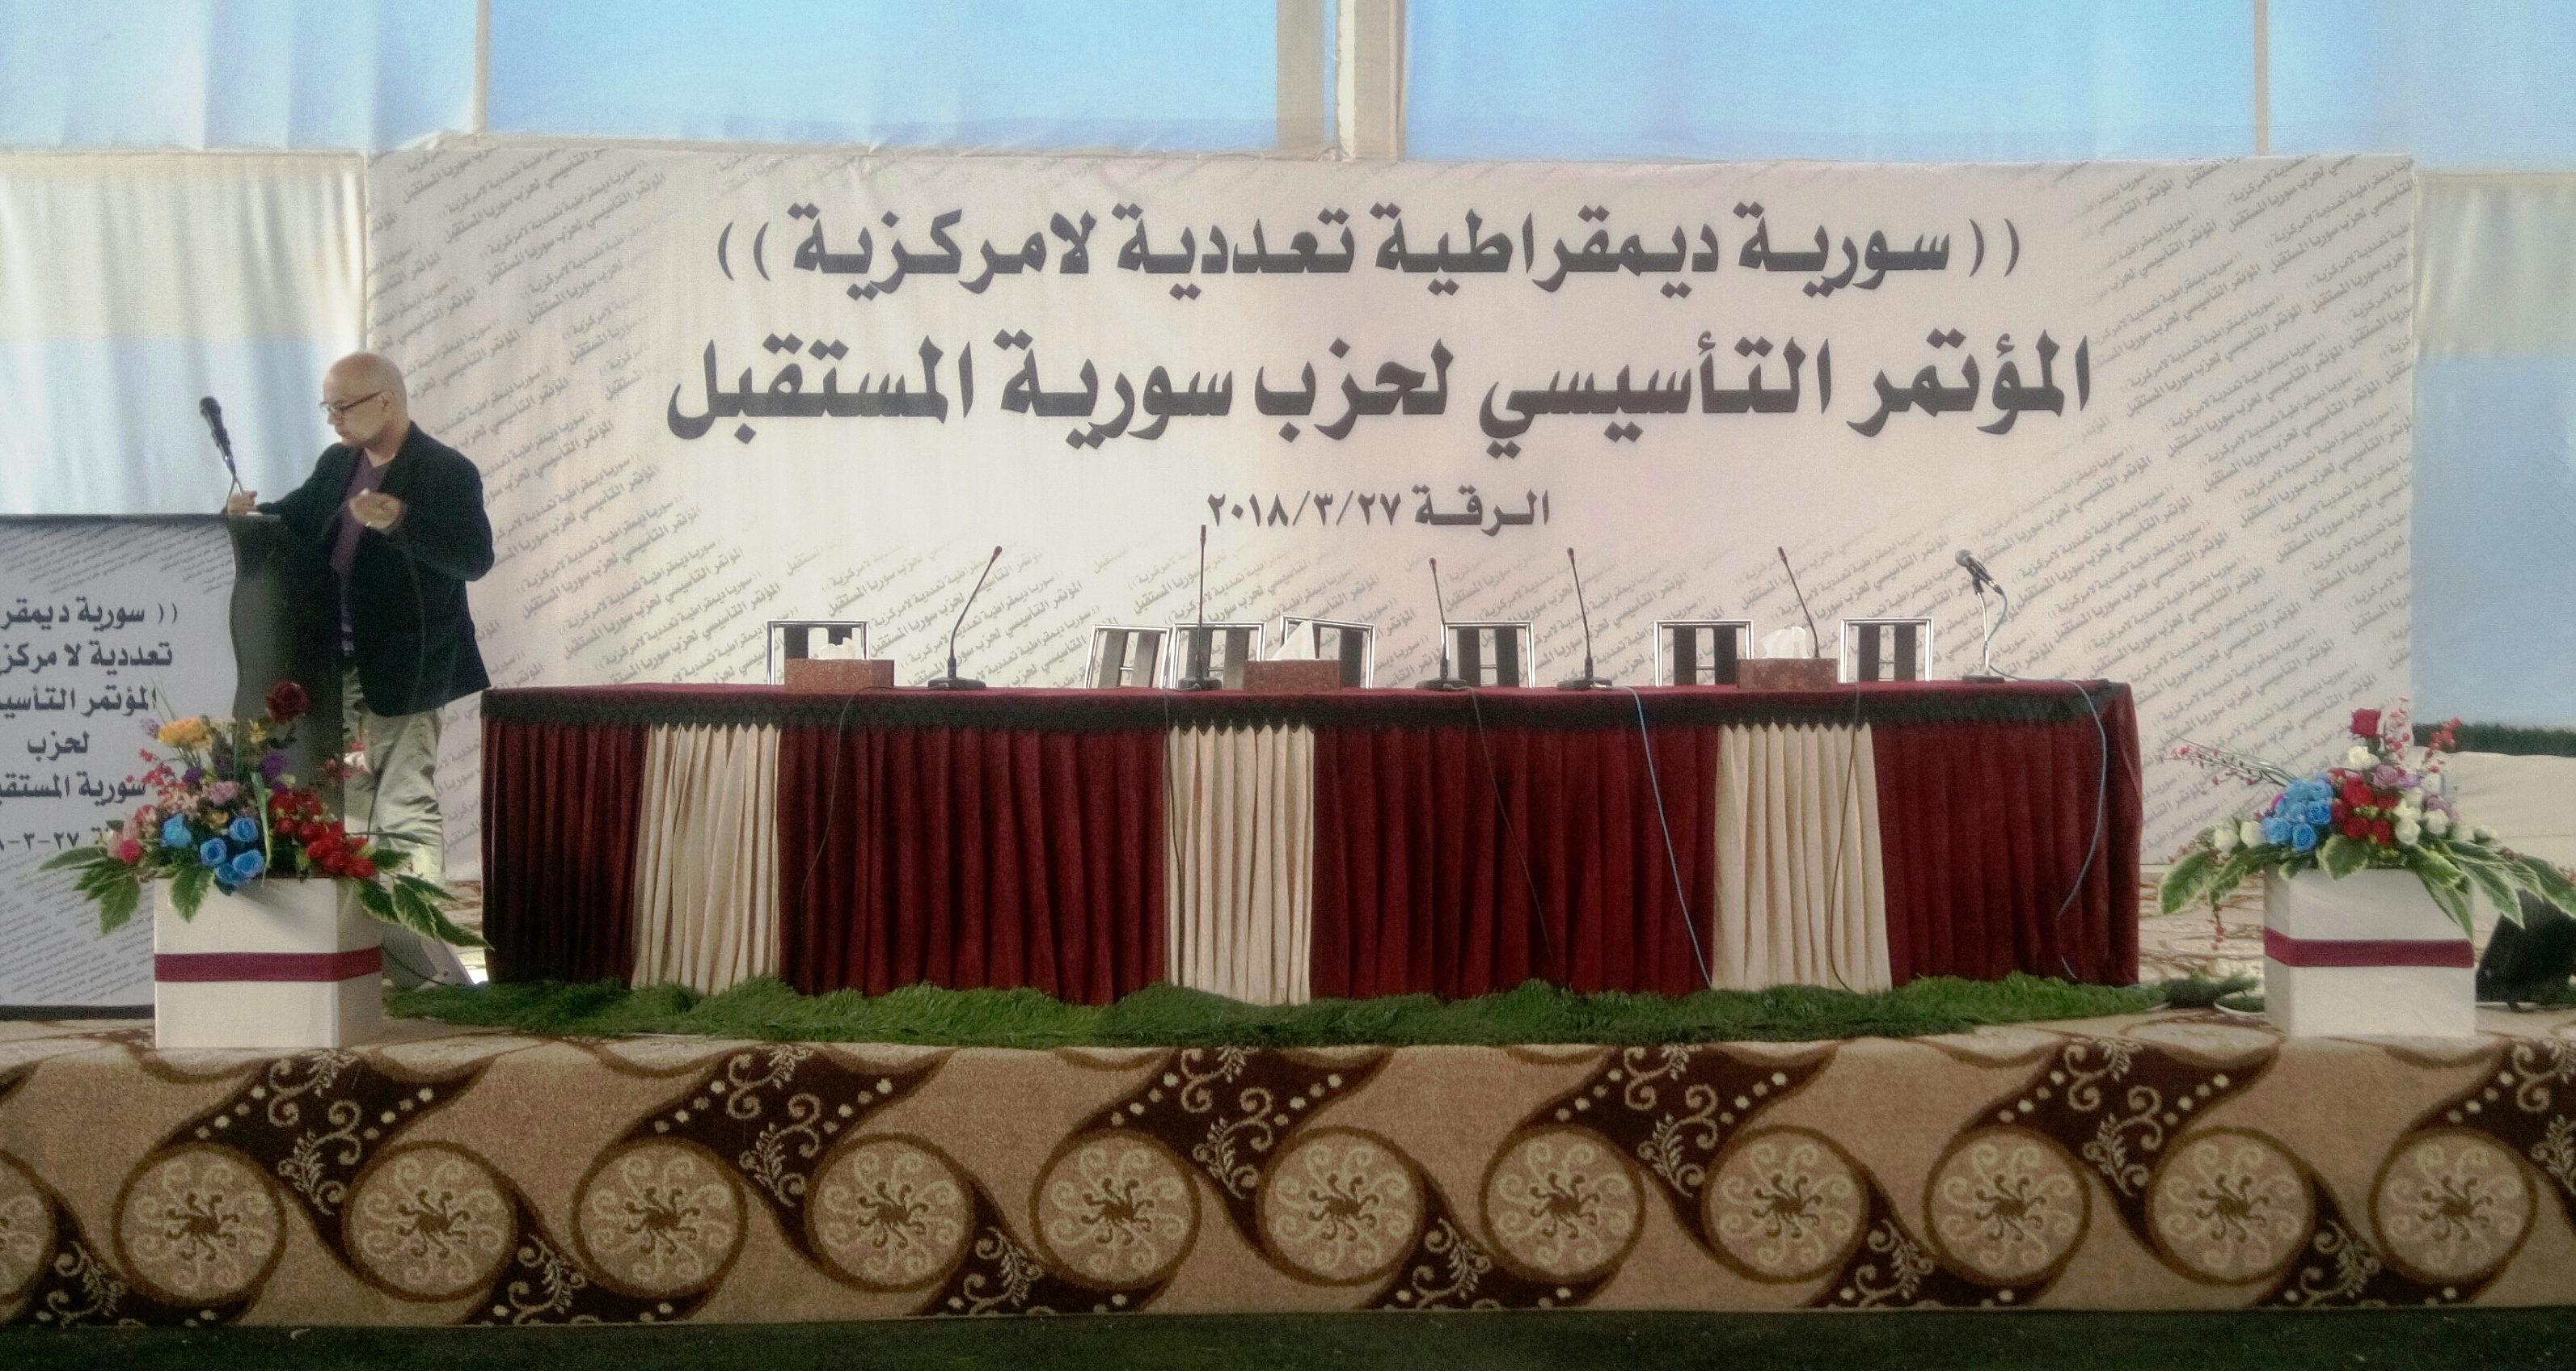 Photo of حزب سوريا المستقبل في ختام مؤتمره يؤكد التزامه بمخرجات جنيف والقرارات الأممية